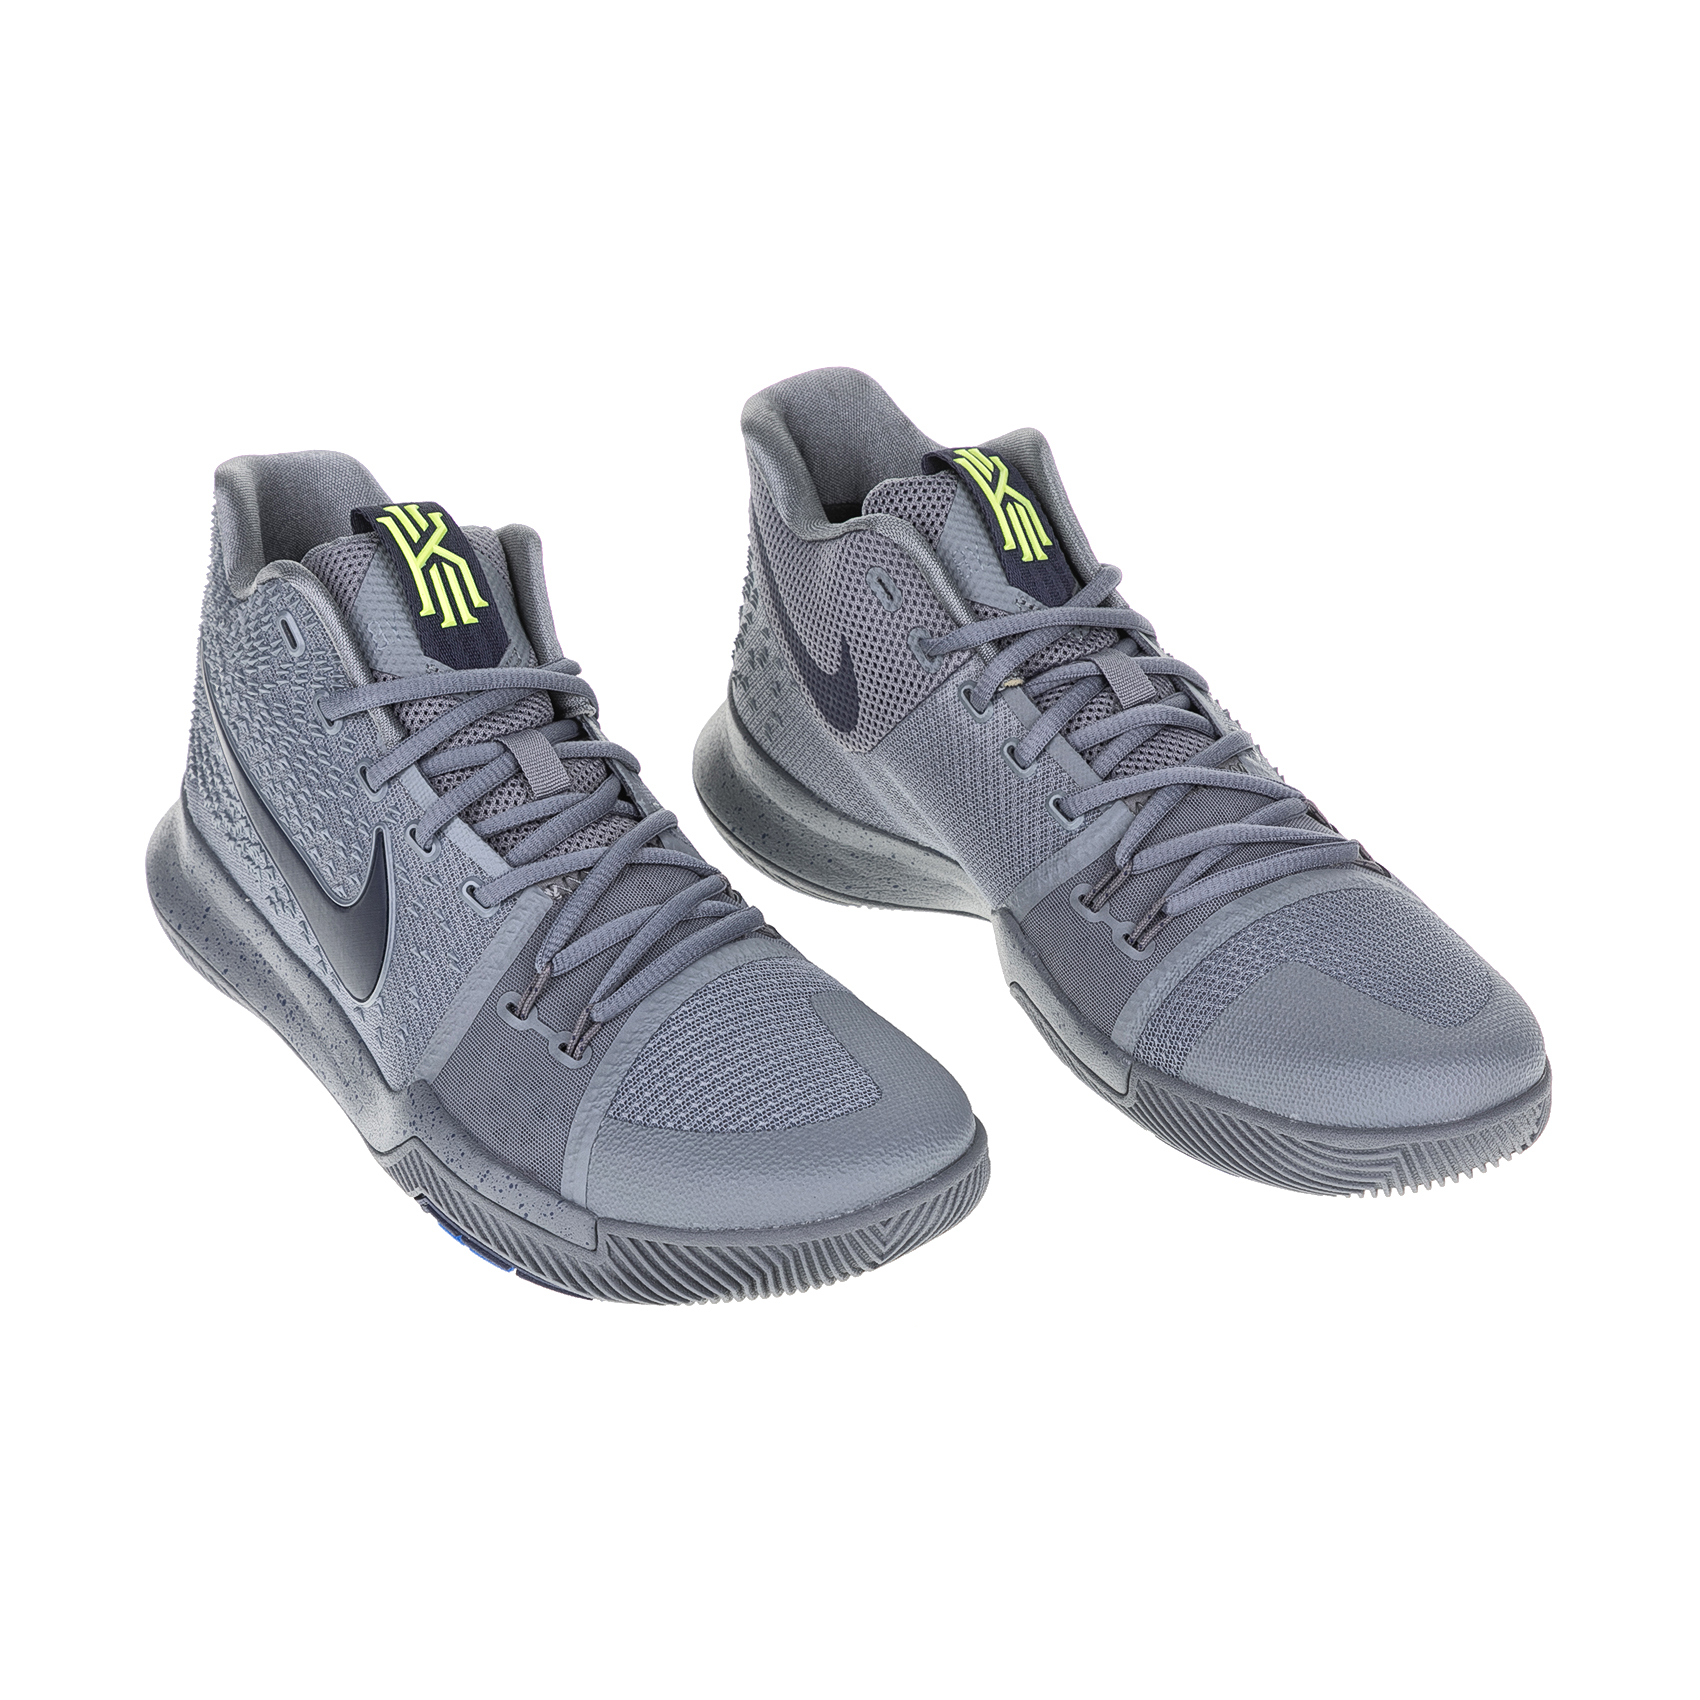 NIKE - Ανδρικά παπούτσια μπάσκετ ΝΙΚΕ KYRIE 3 γκρι